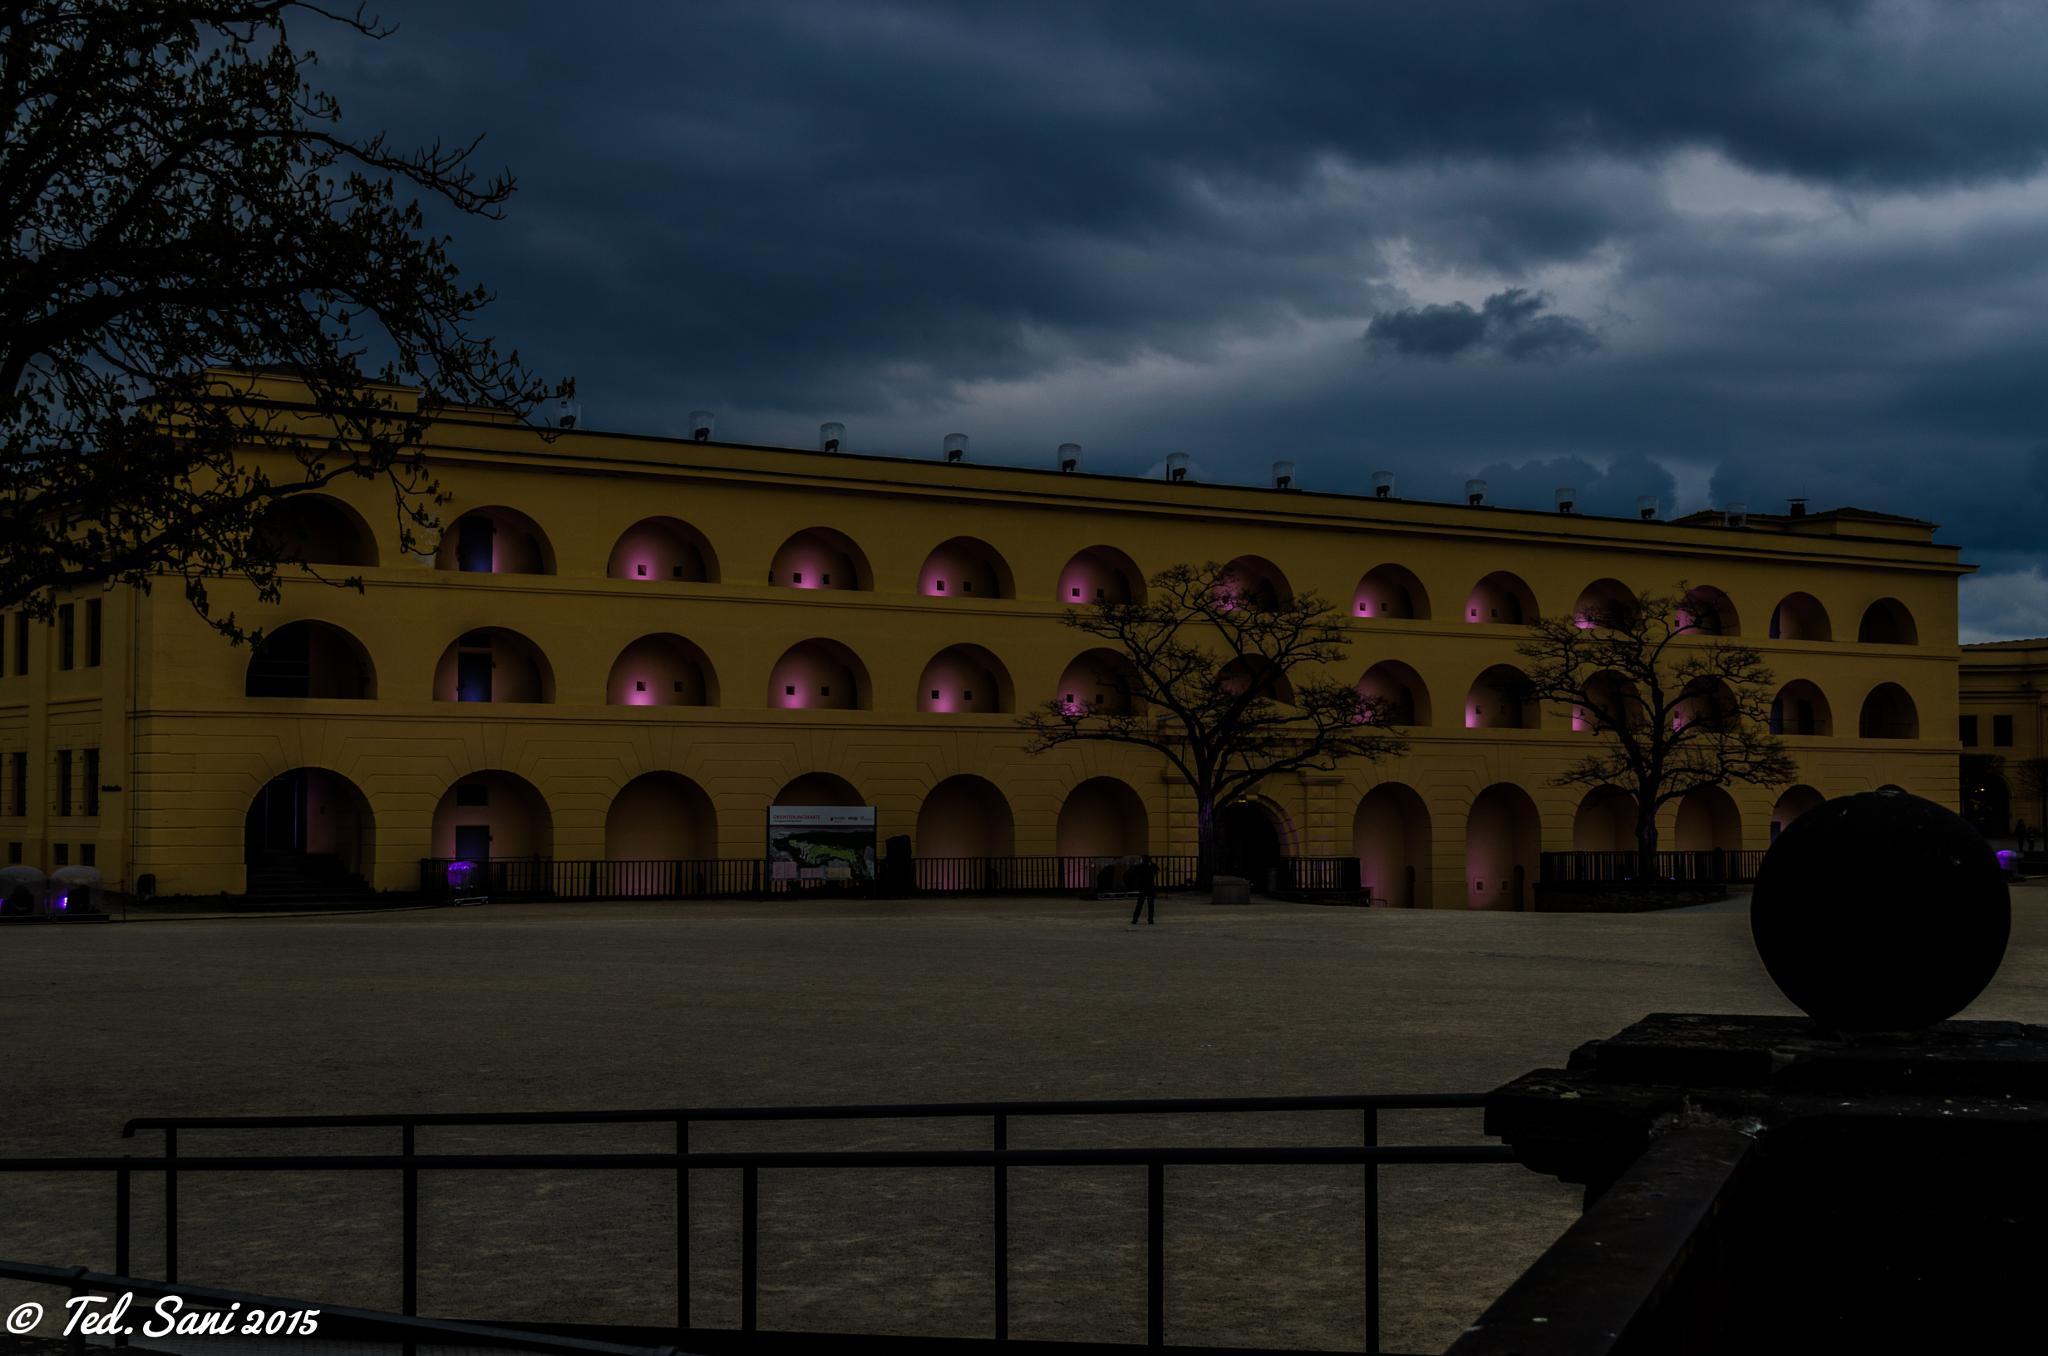 Festungsleuchten 2015 by MKalker/TedSani